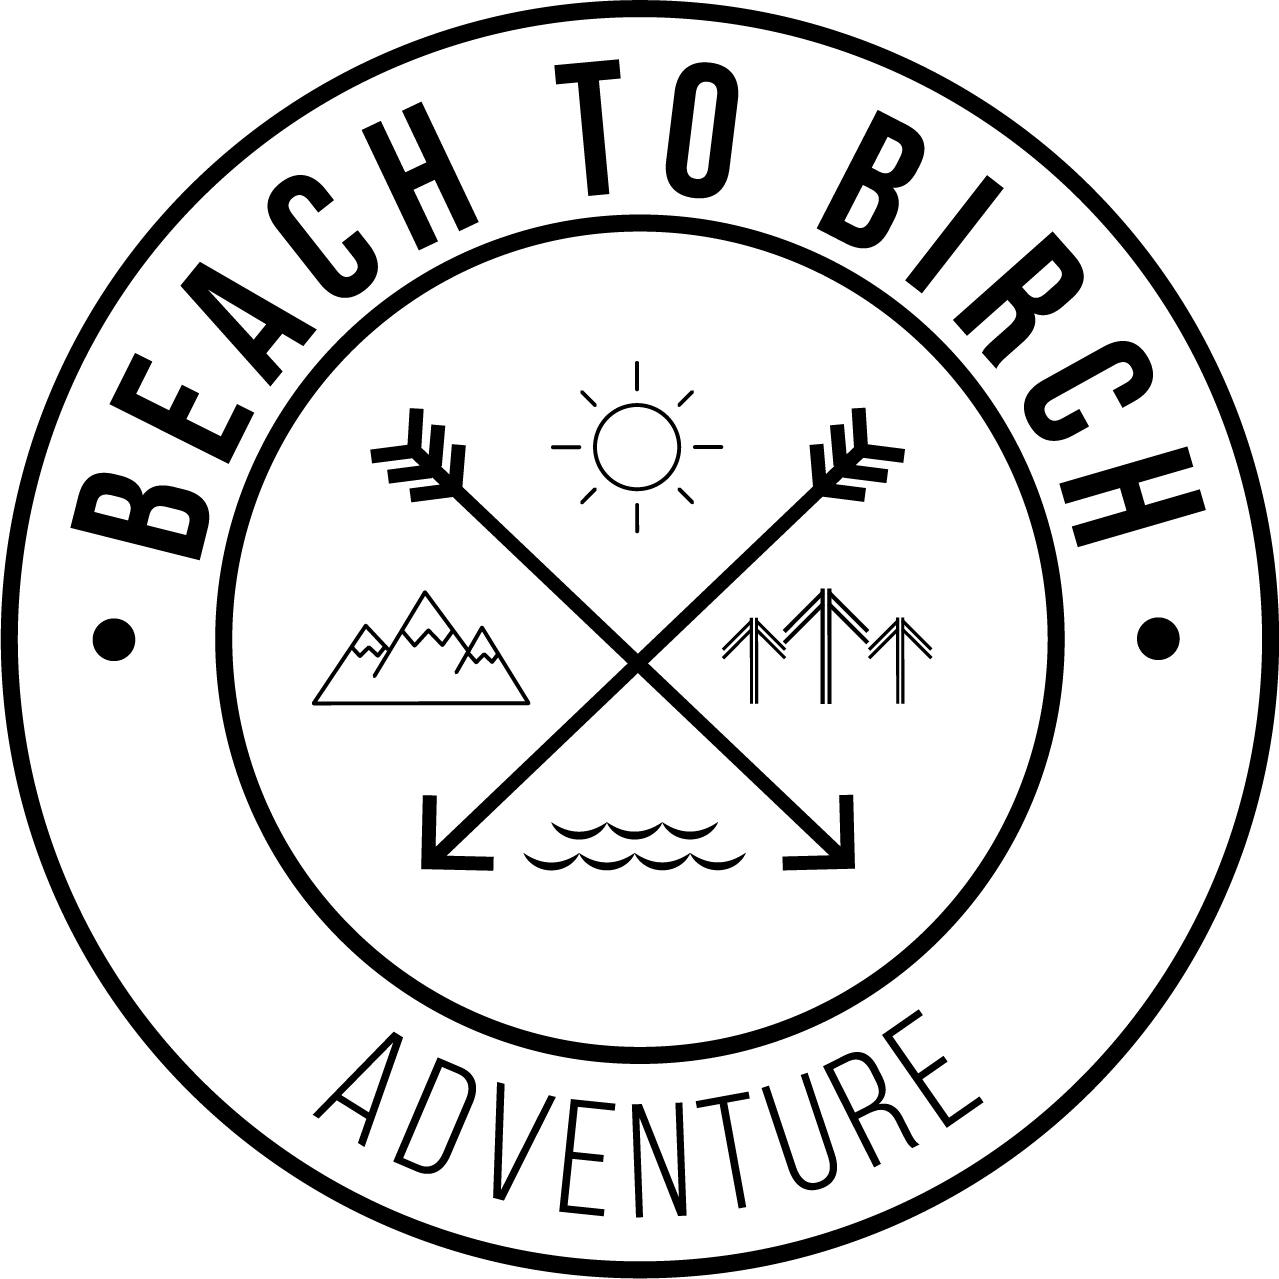 BEACH TO BIRCH.jpg